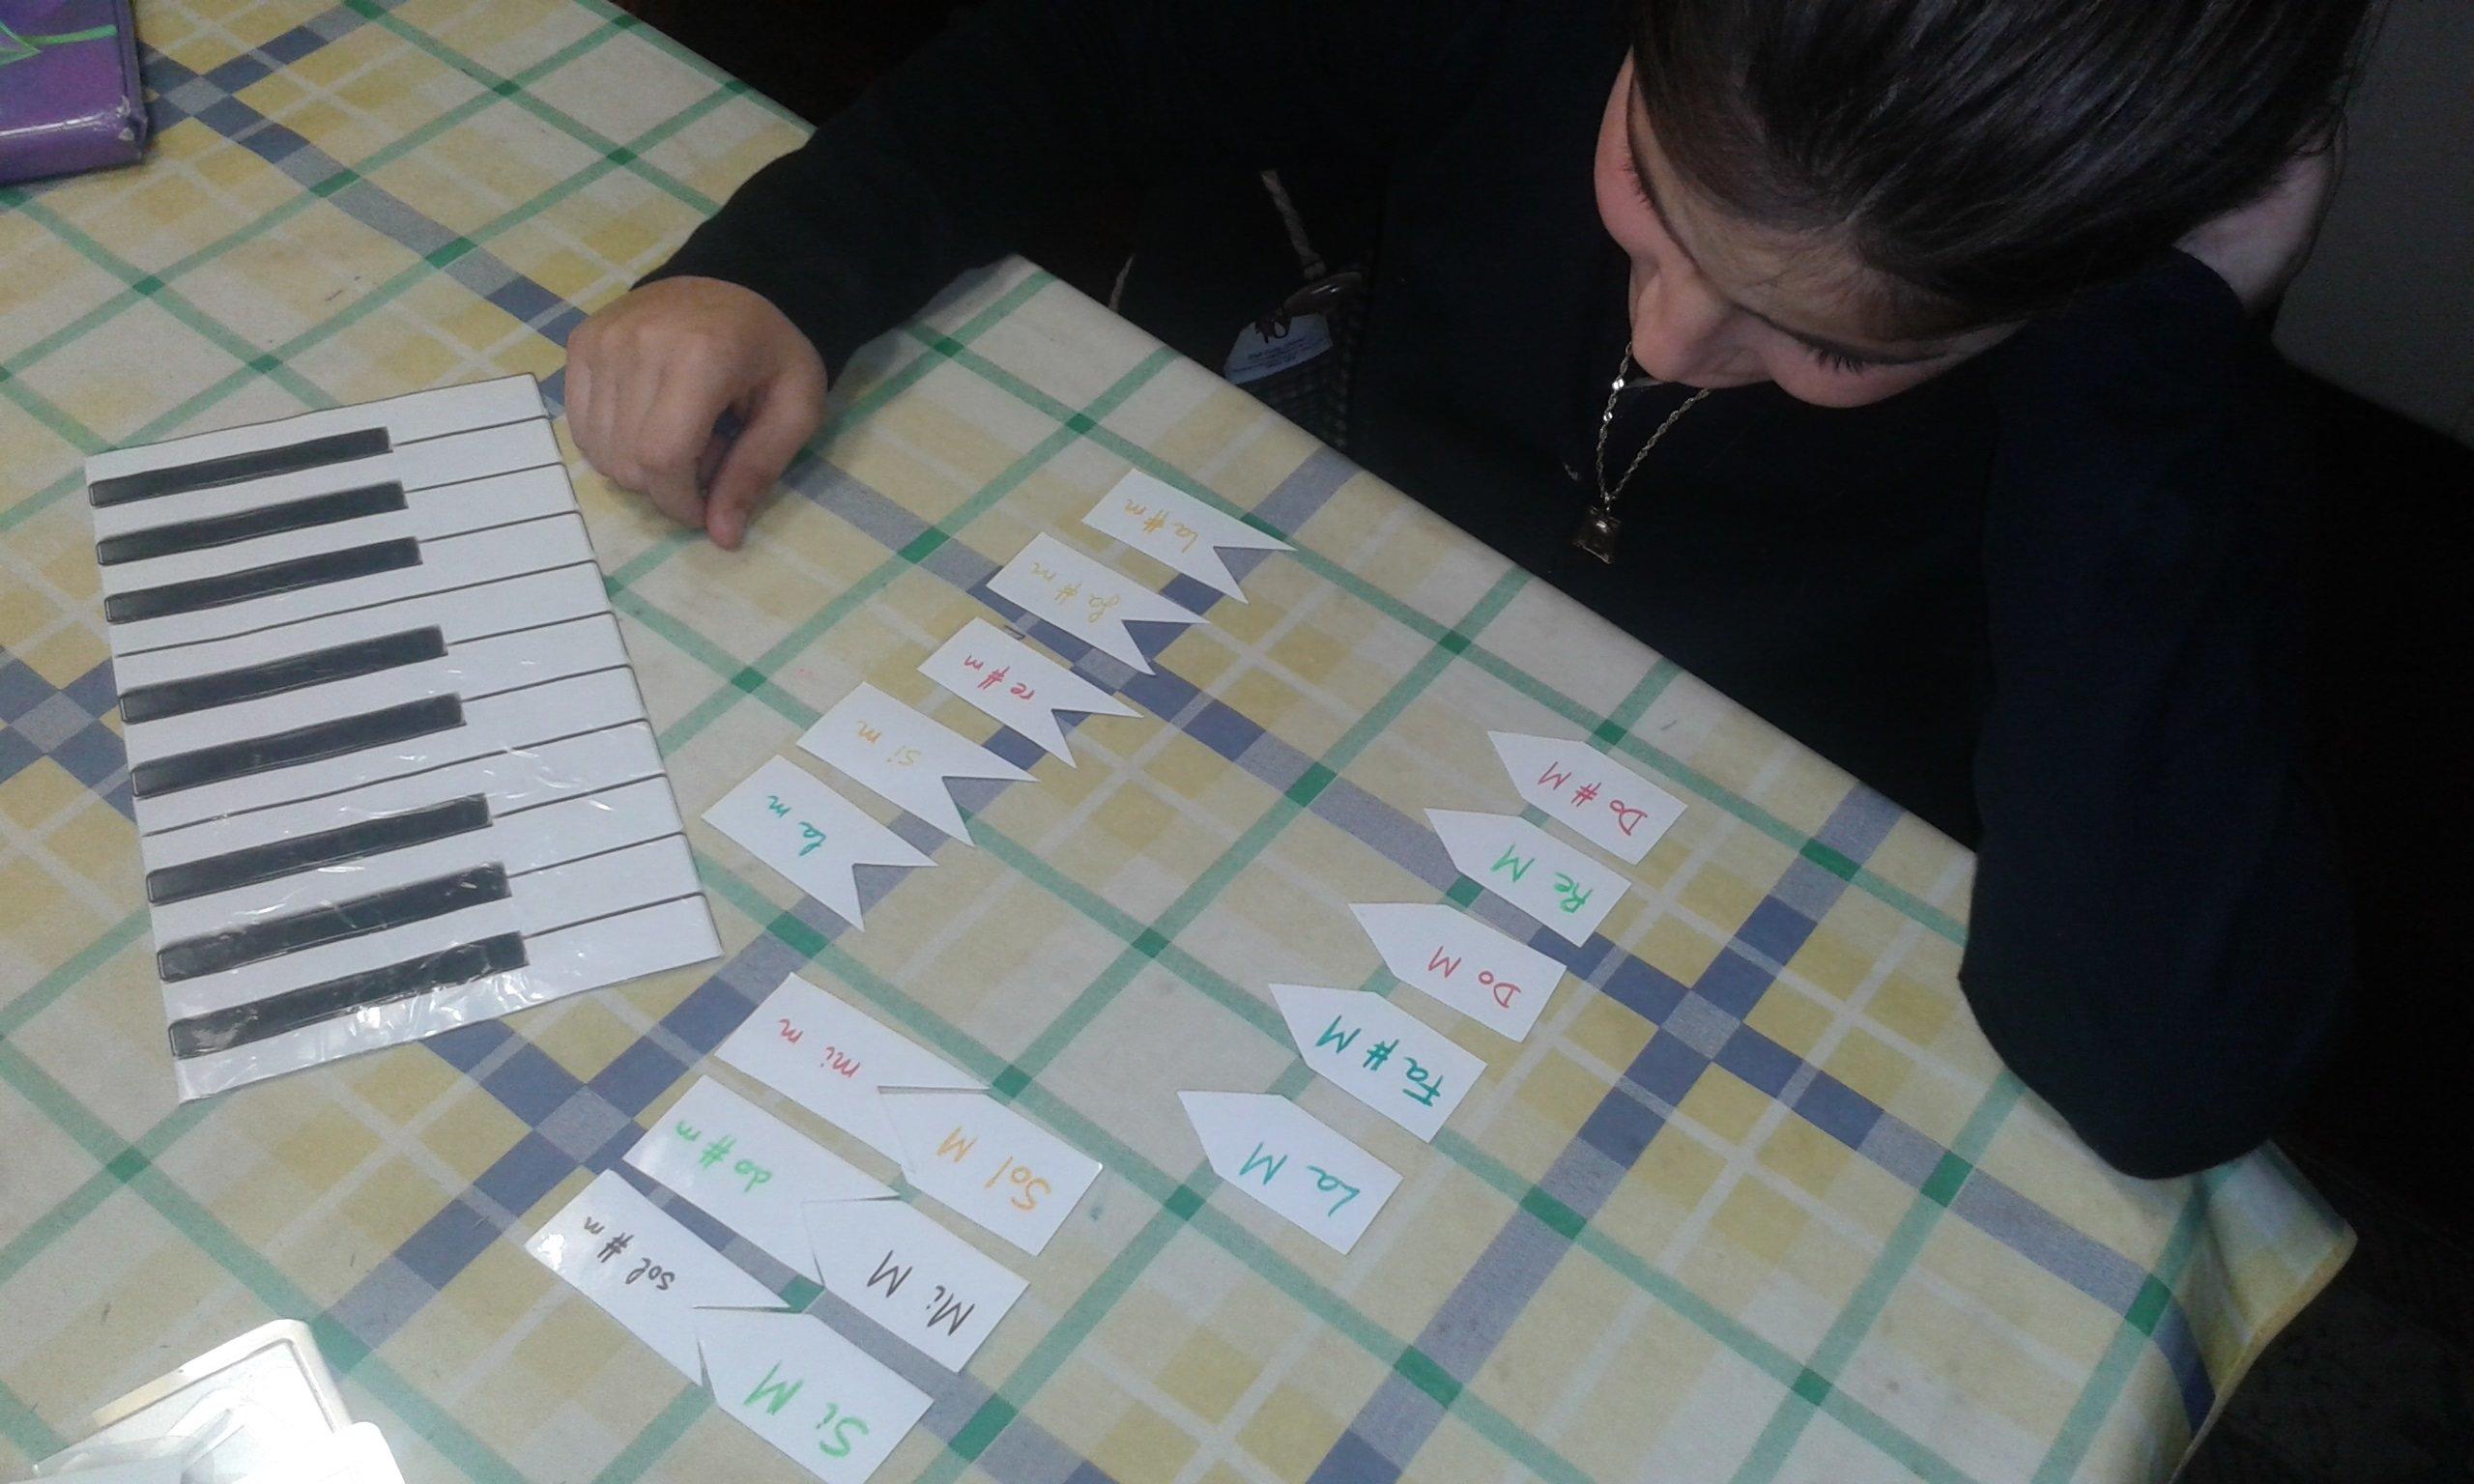 juego tonalidades María.jpg